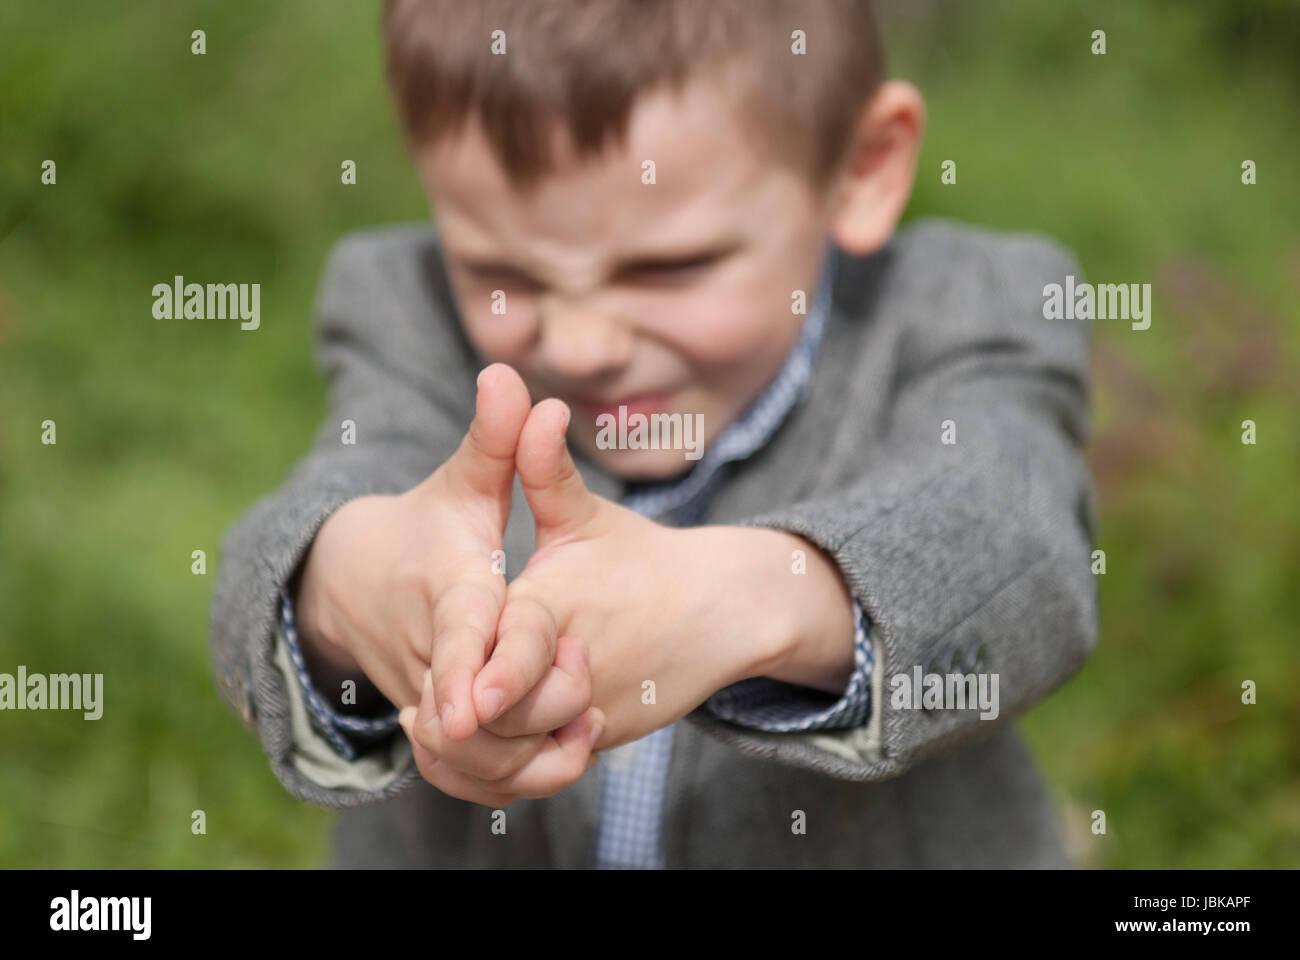 Little boy imitates a gun - Stock Image